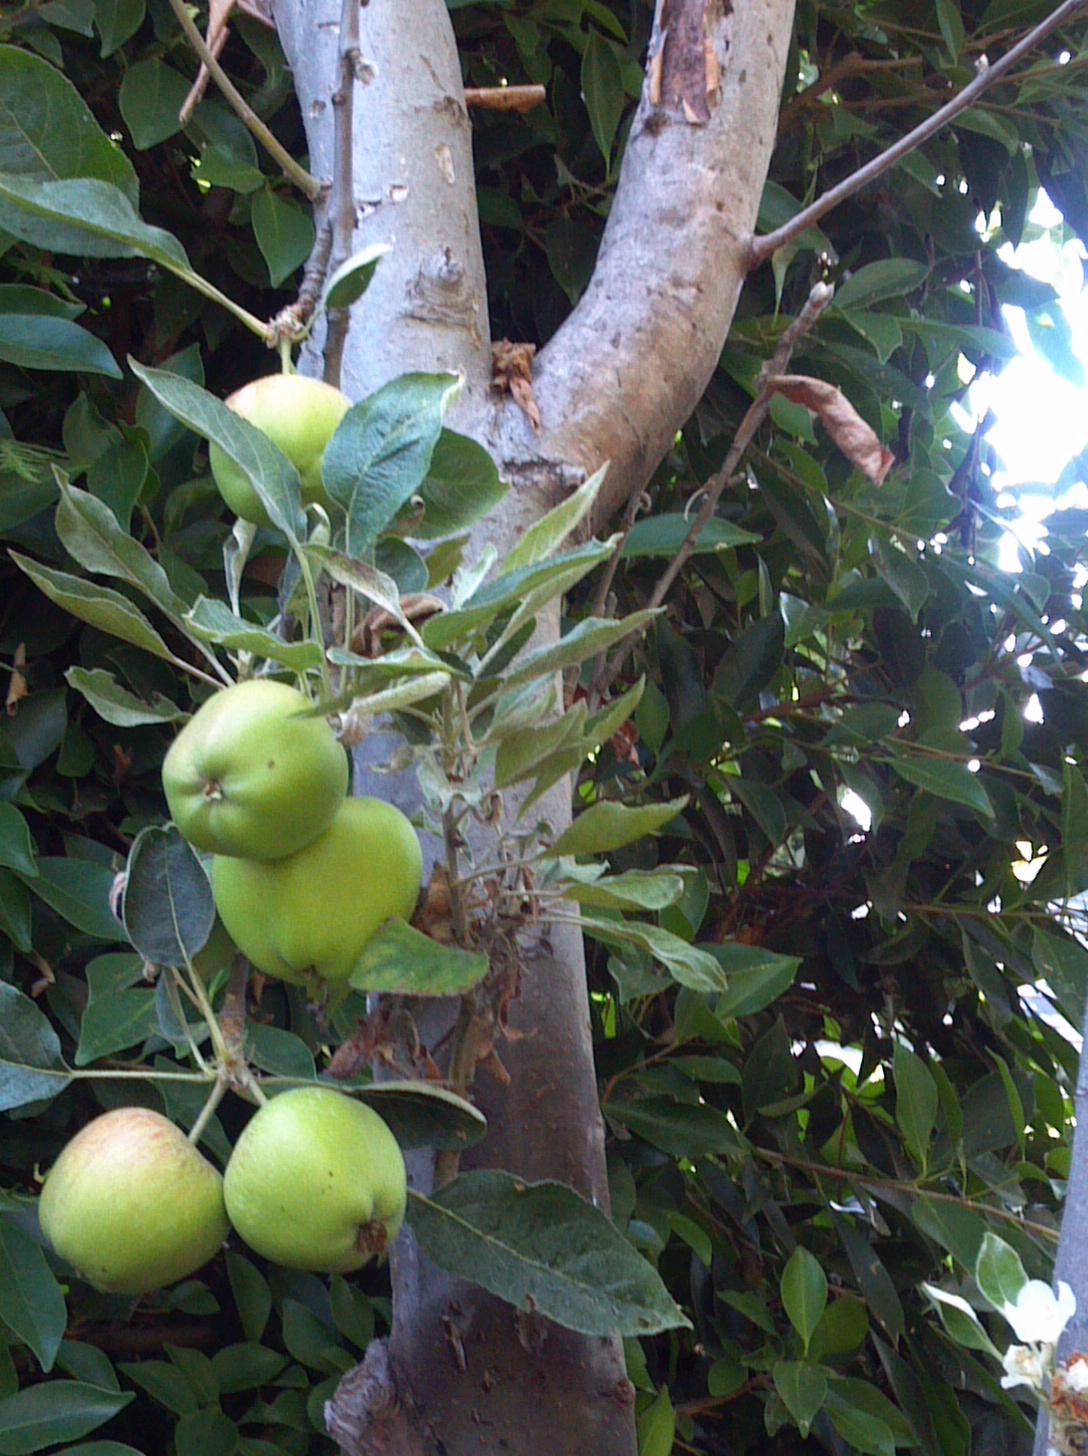 backyard apple tree los angeles 2012